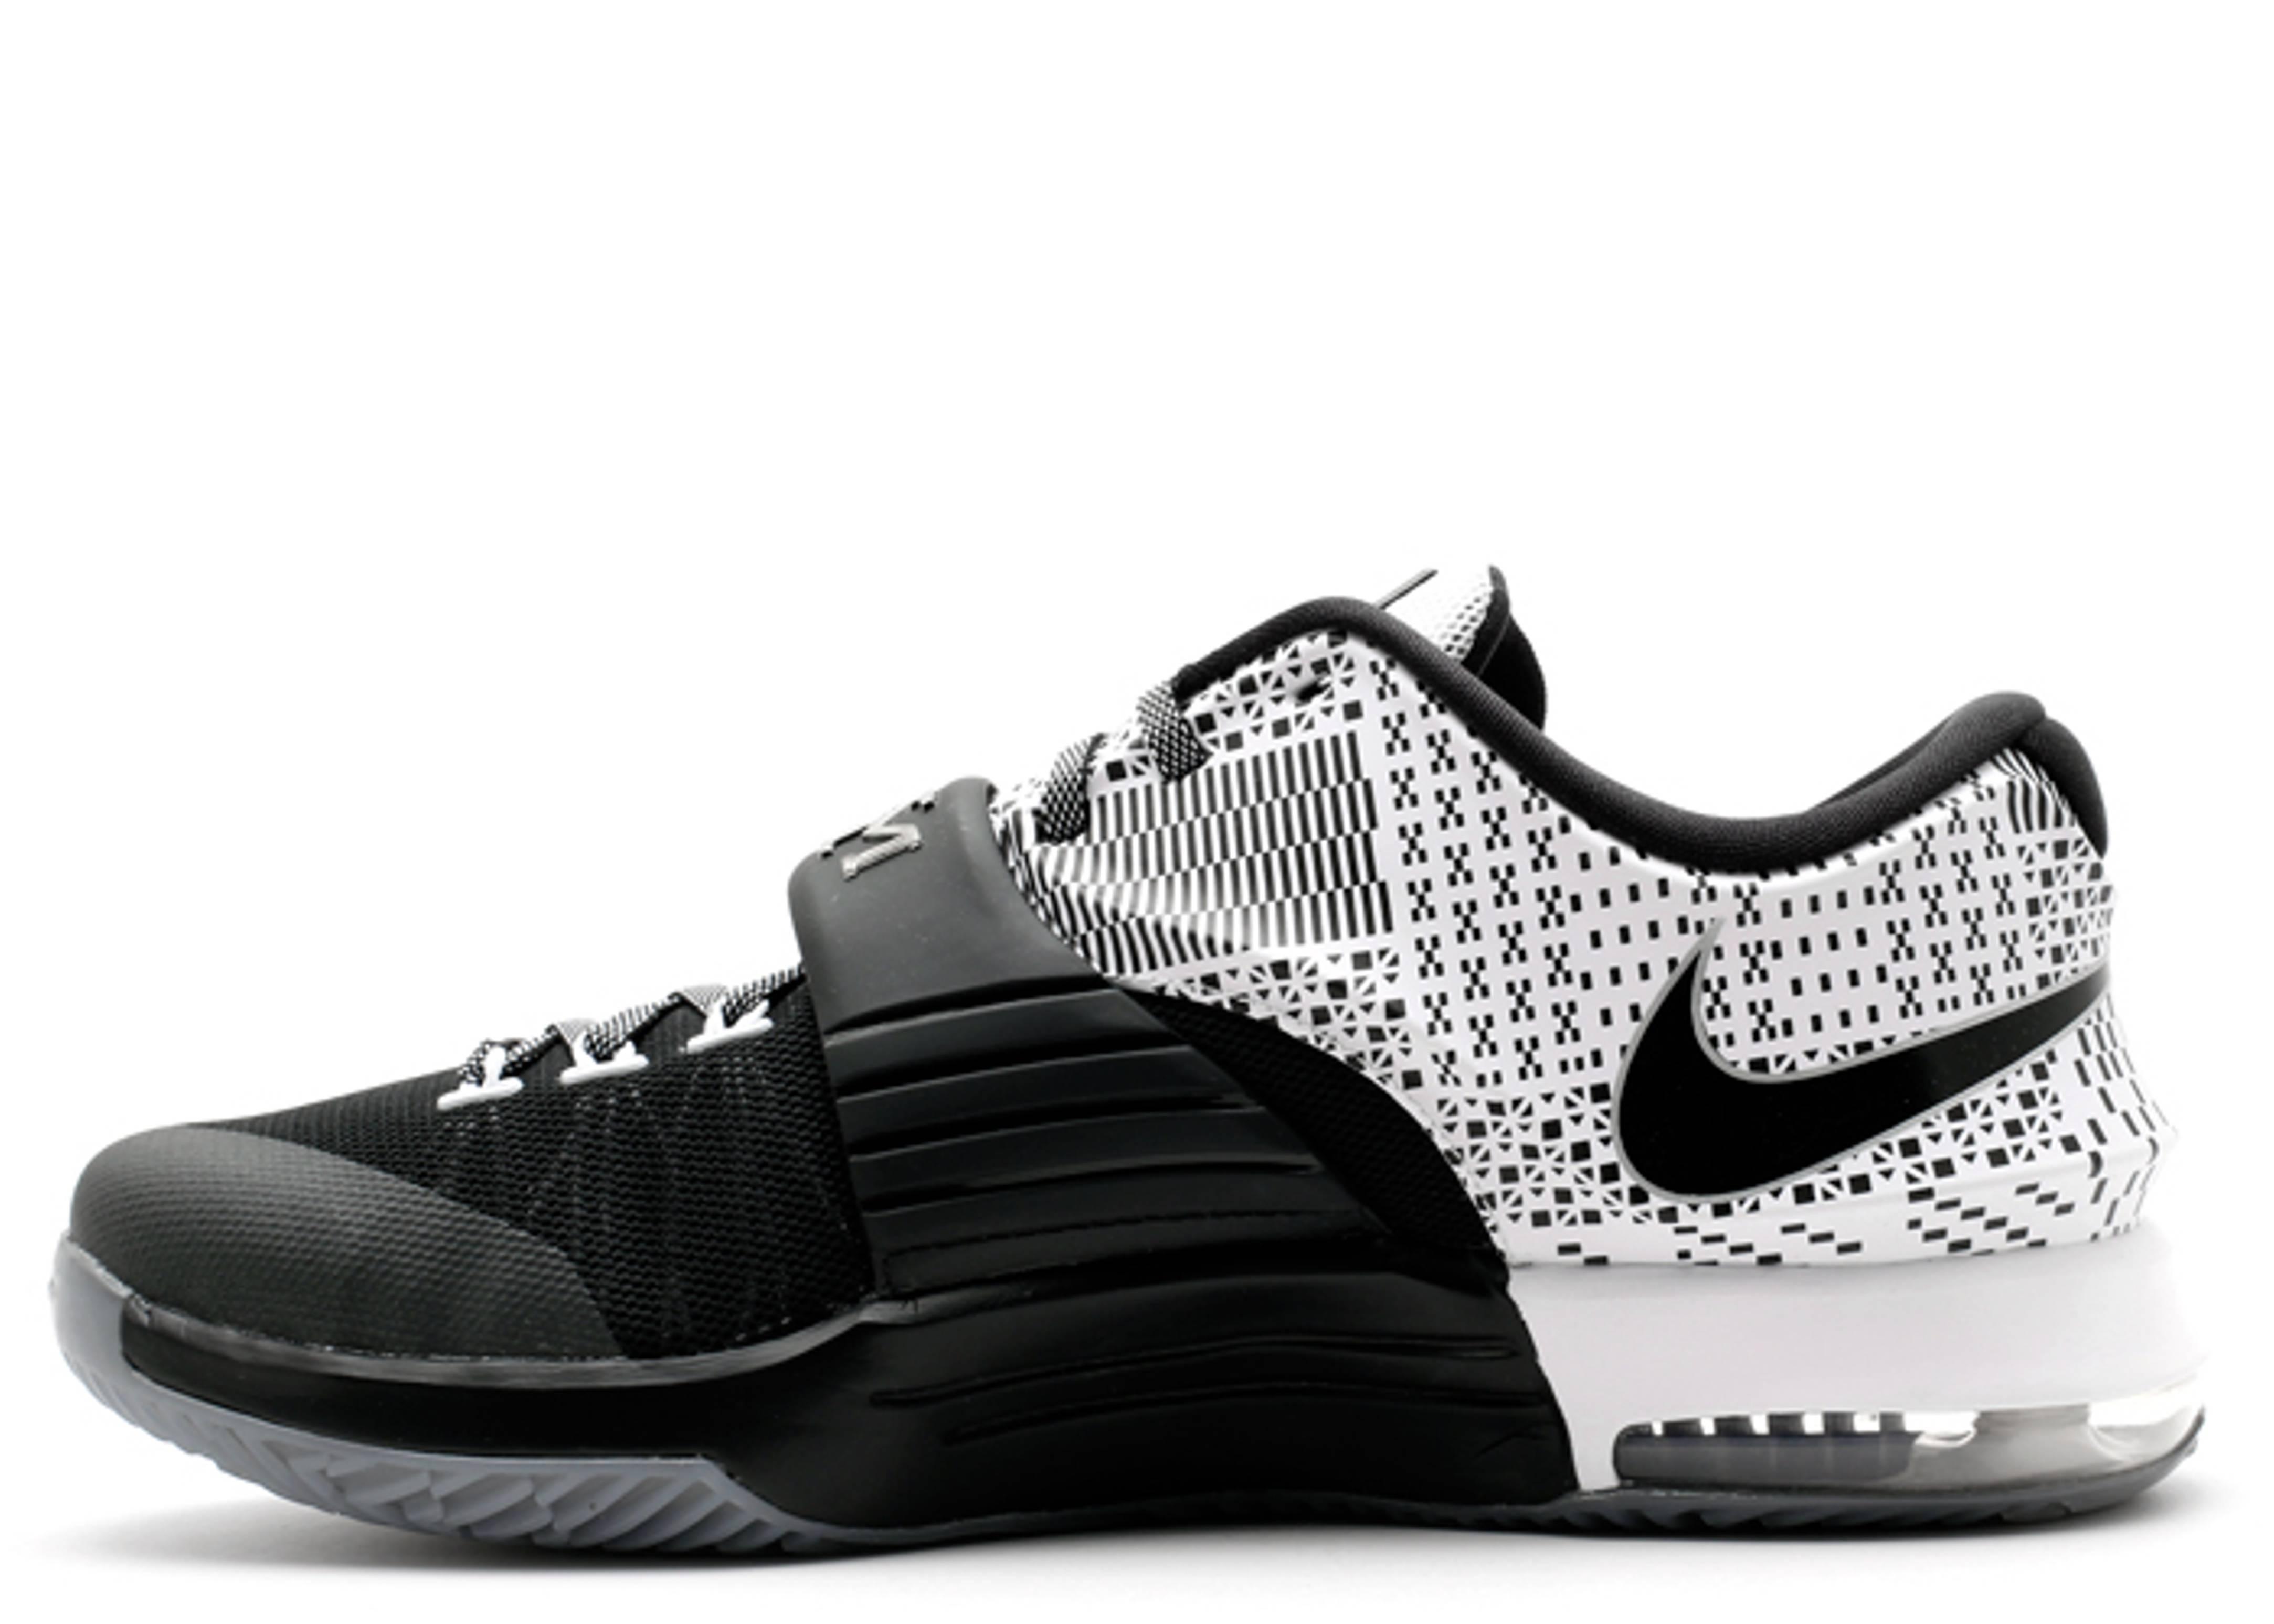 Weird Nike Shoes Free Run Dark Magnet Grey Dark Magnet Grey